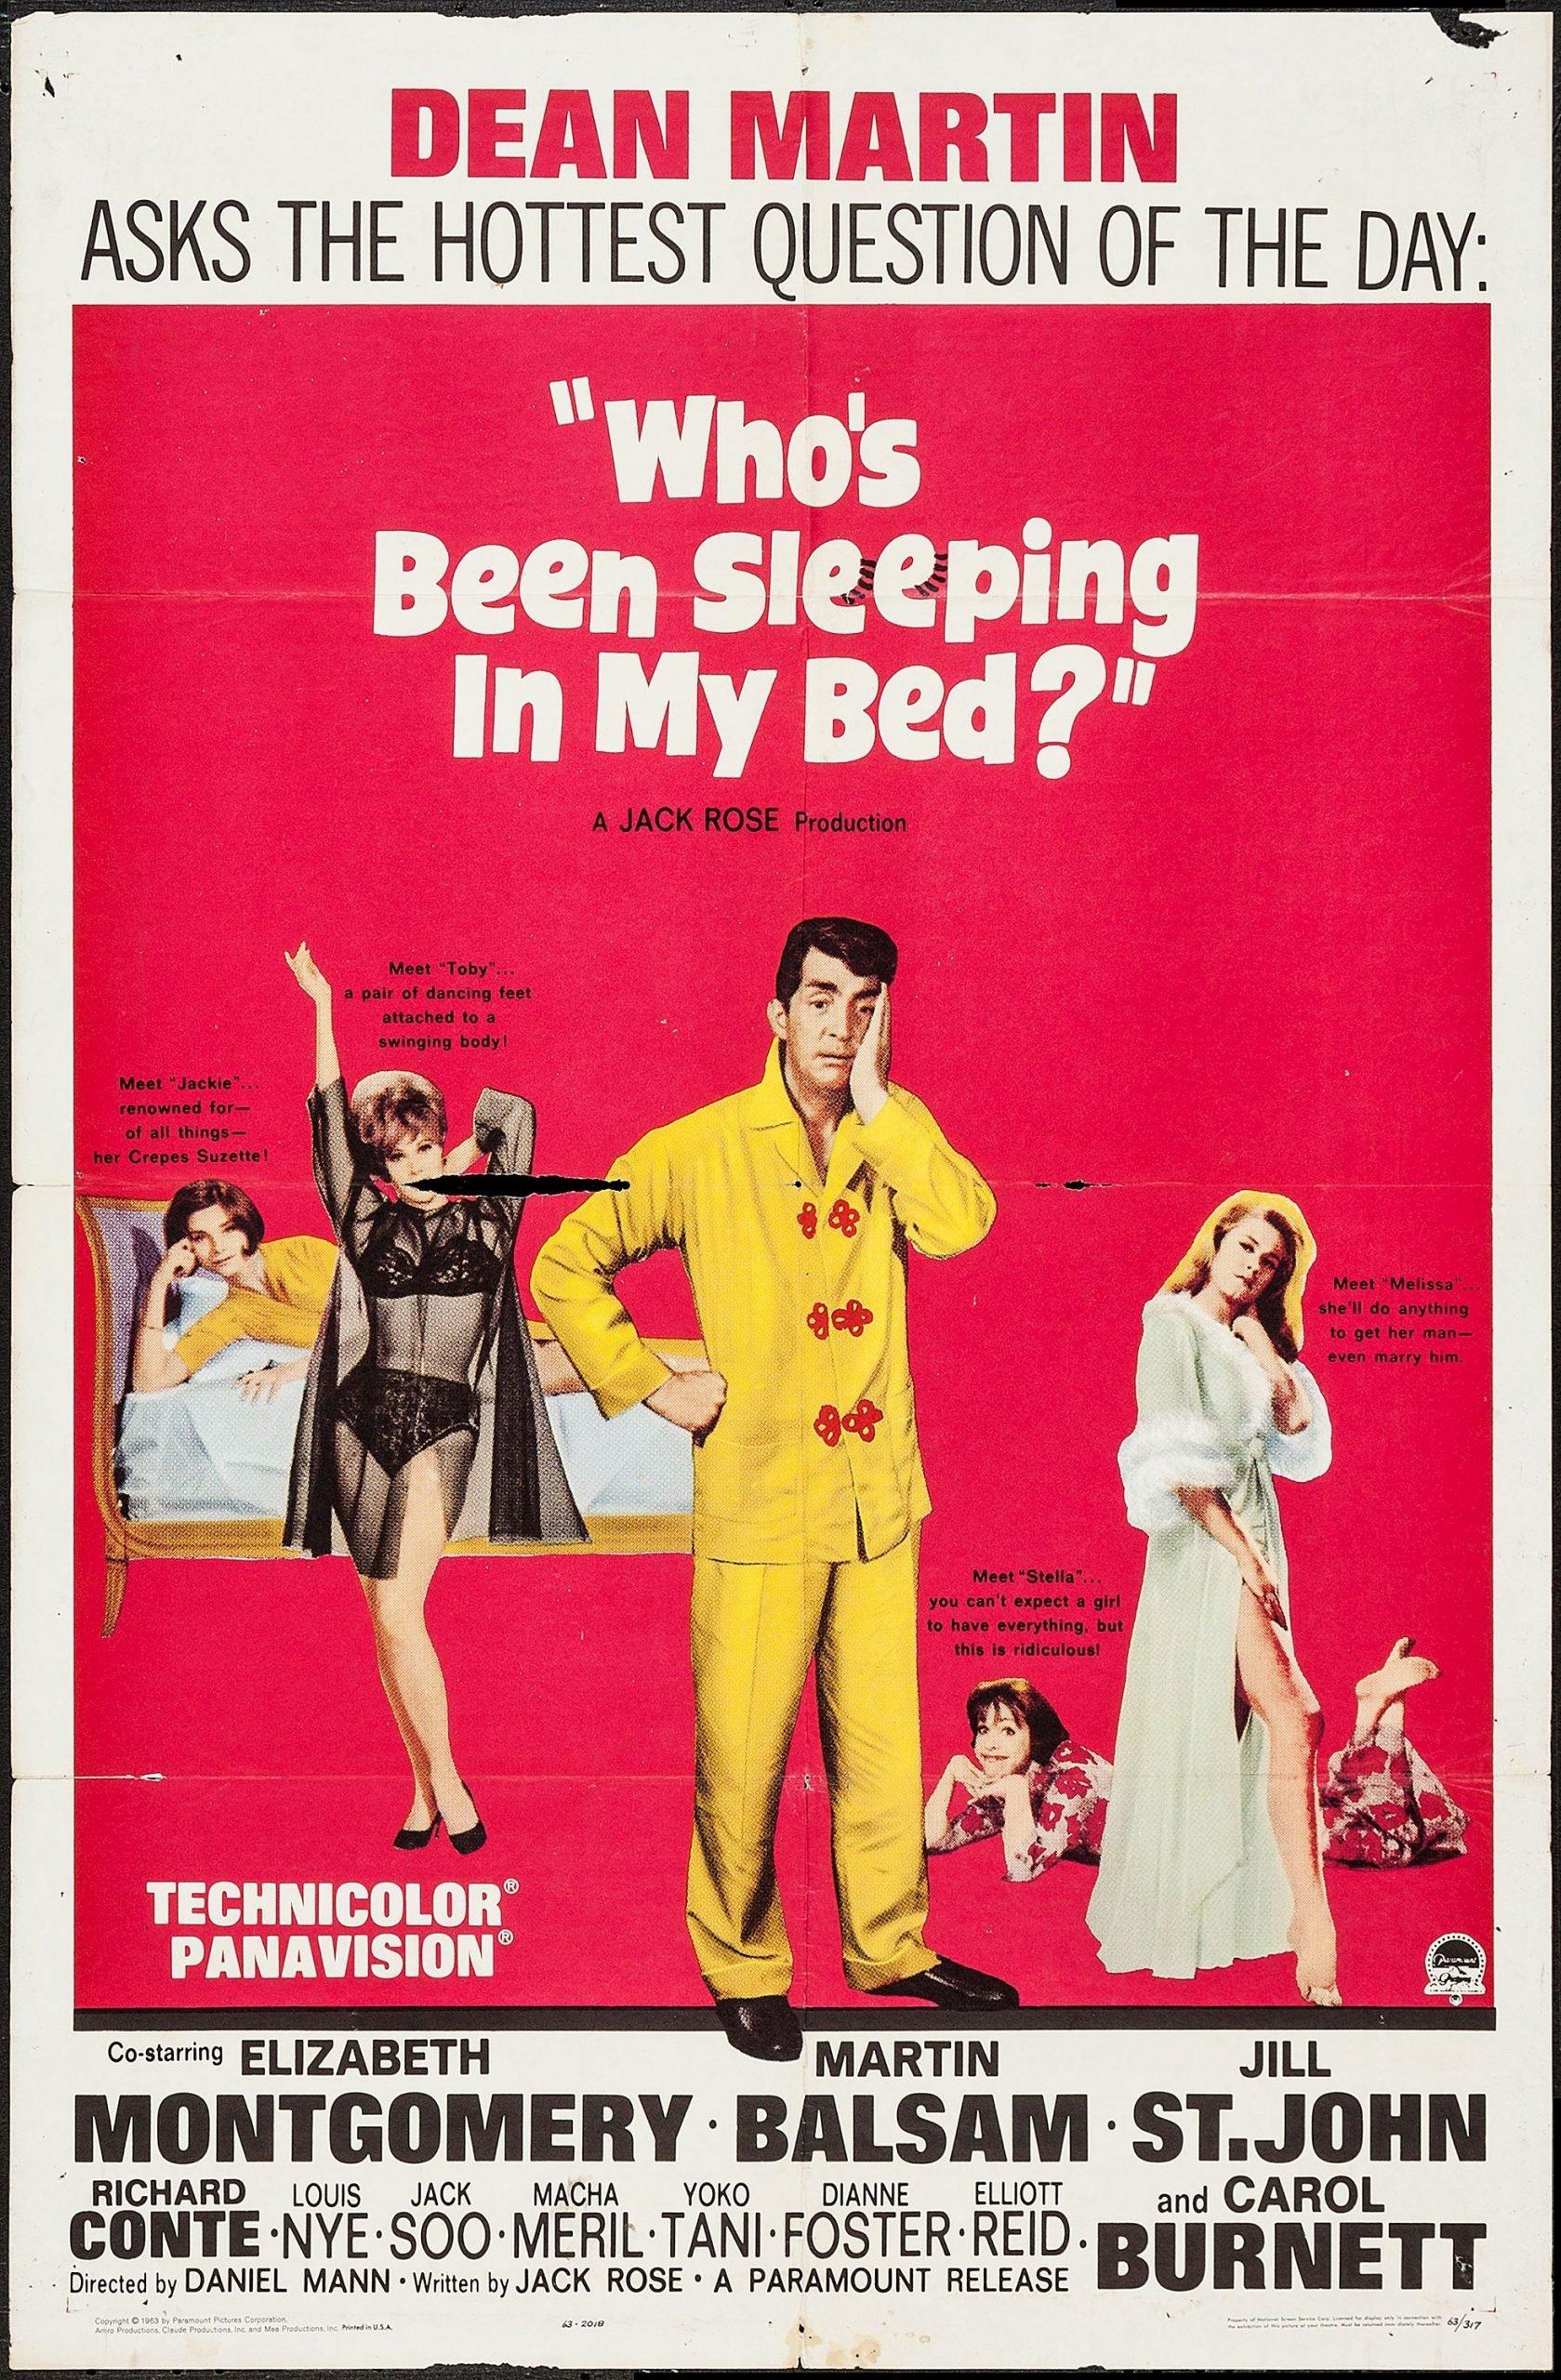 elizabeth-montgomery-whos-been-sleeping-in-my-bed-poster-dean-martin